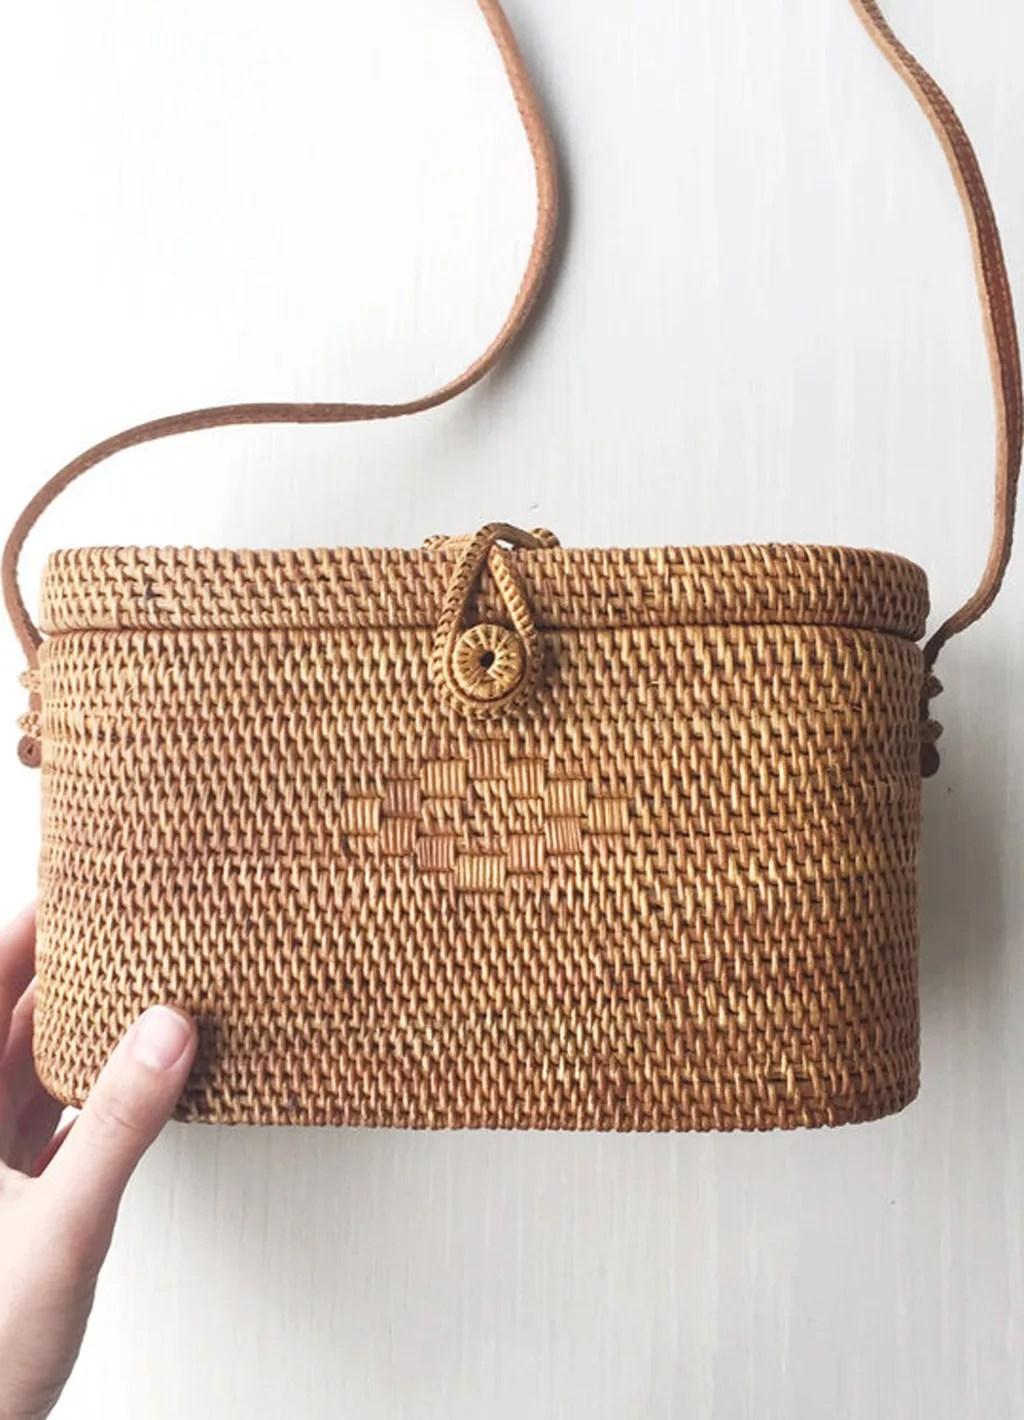 Spring 2018 Wardrobe Essentials: Straw Bag